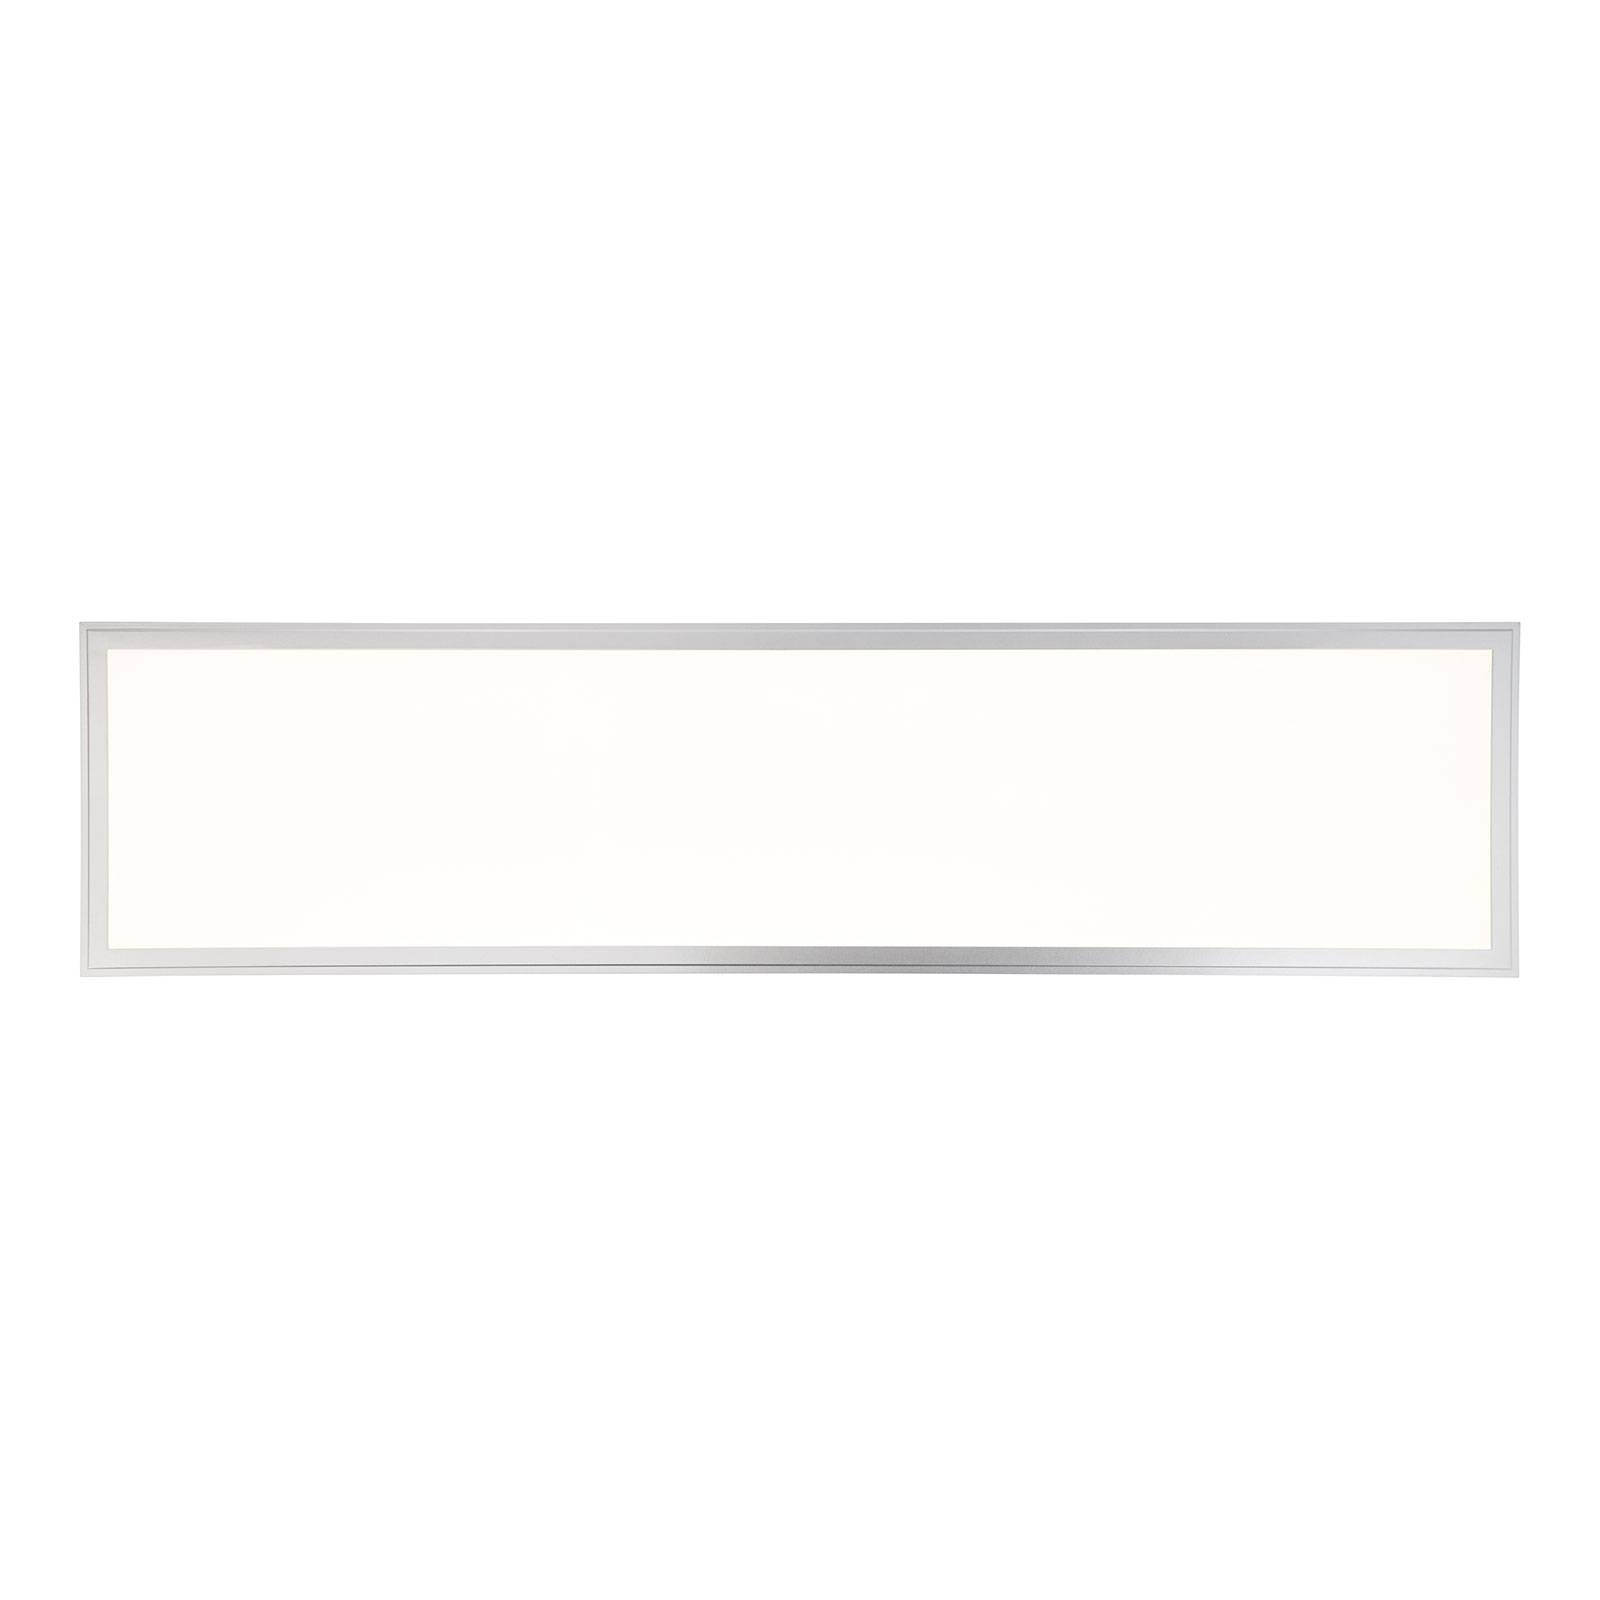 Lampa sufitowa LED Alissa, 119,5x29,5 cm